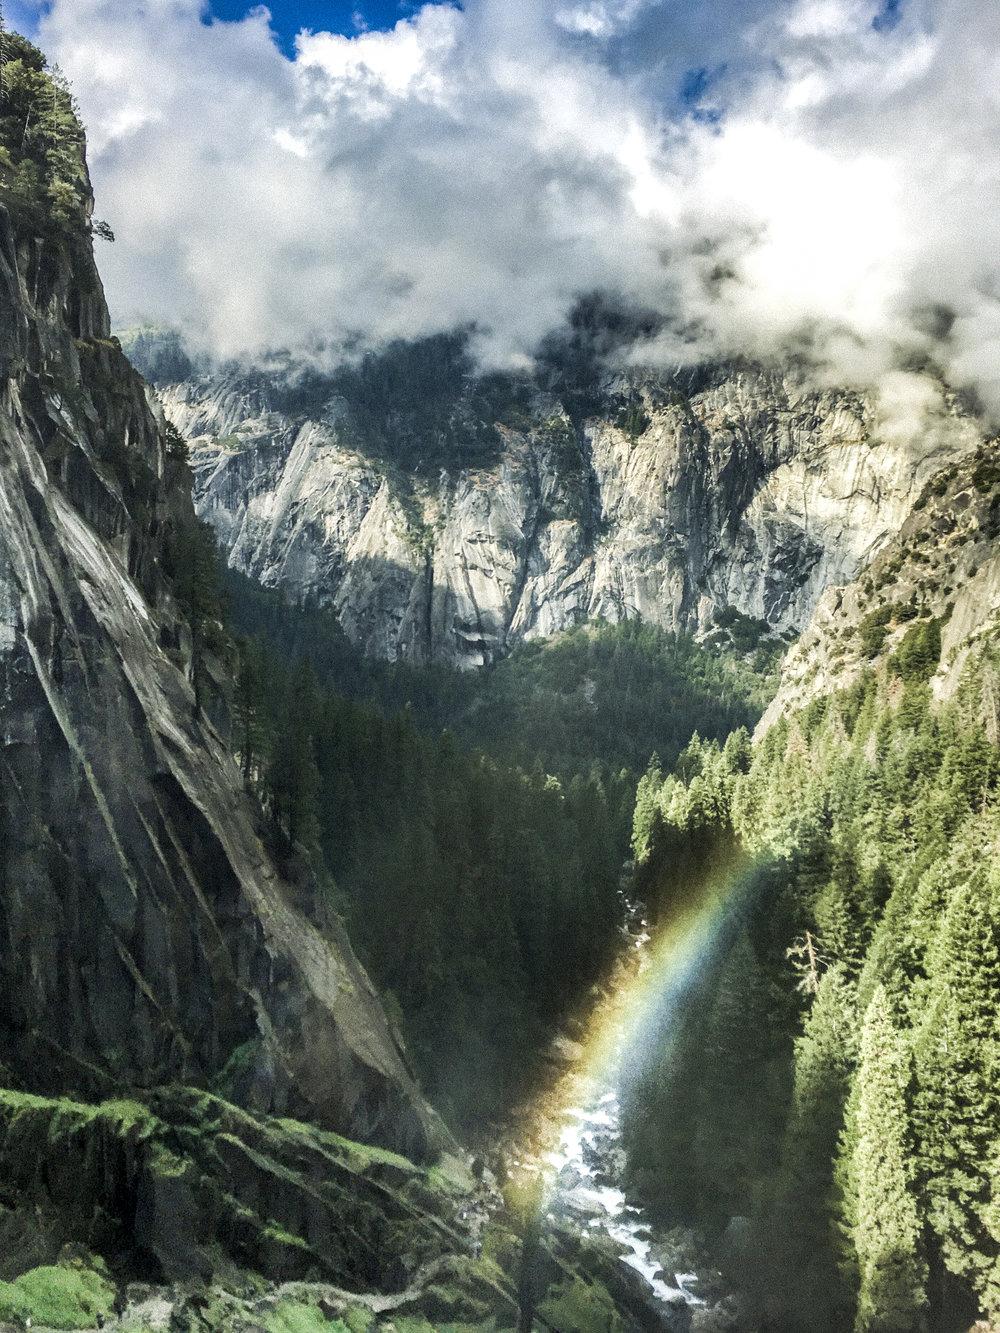 california_adventure_roberto_flores_buck_10.jpg